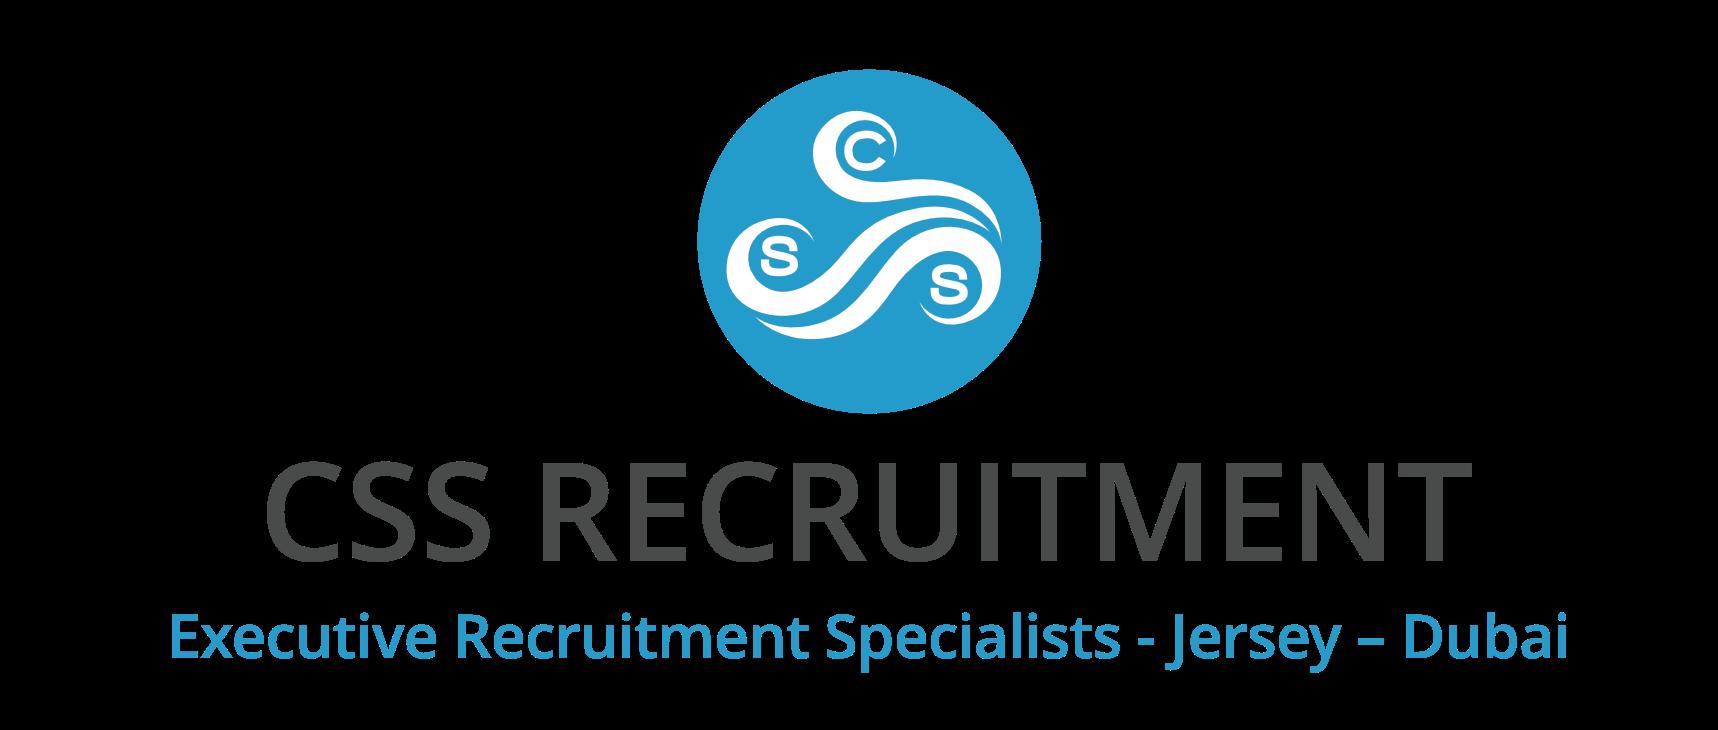 CSS Recruitment Limited logo